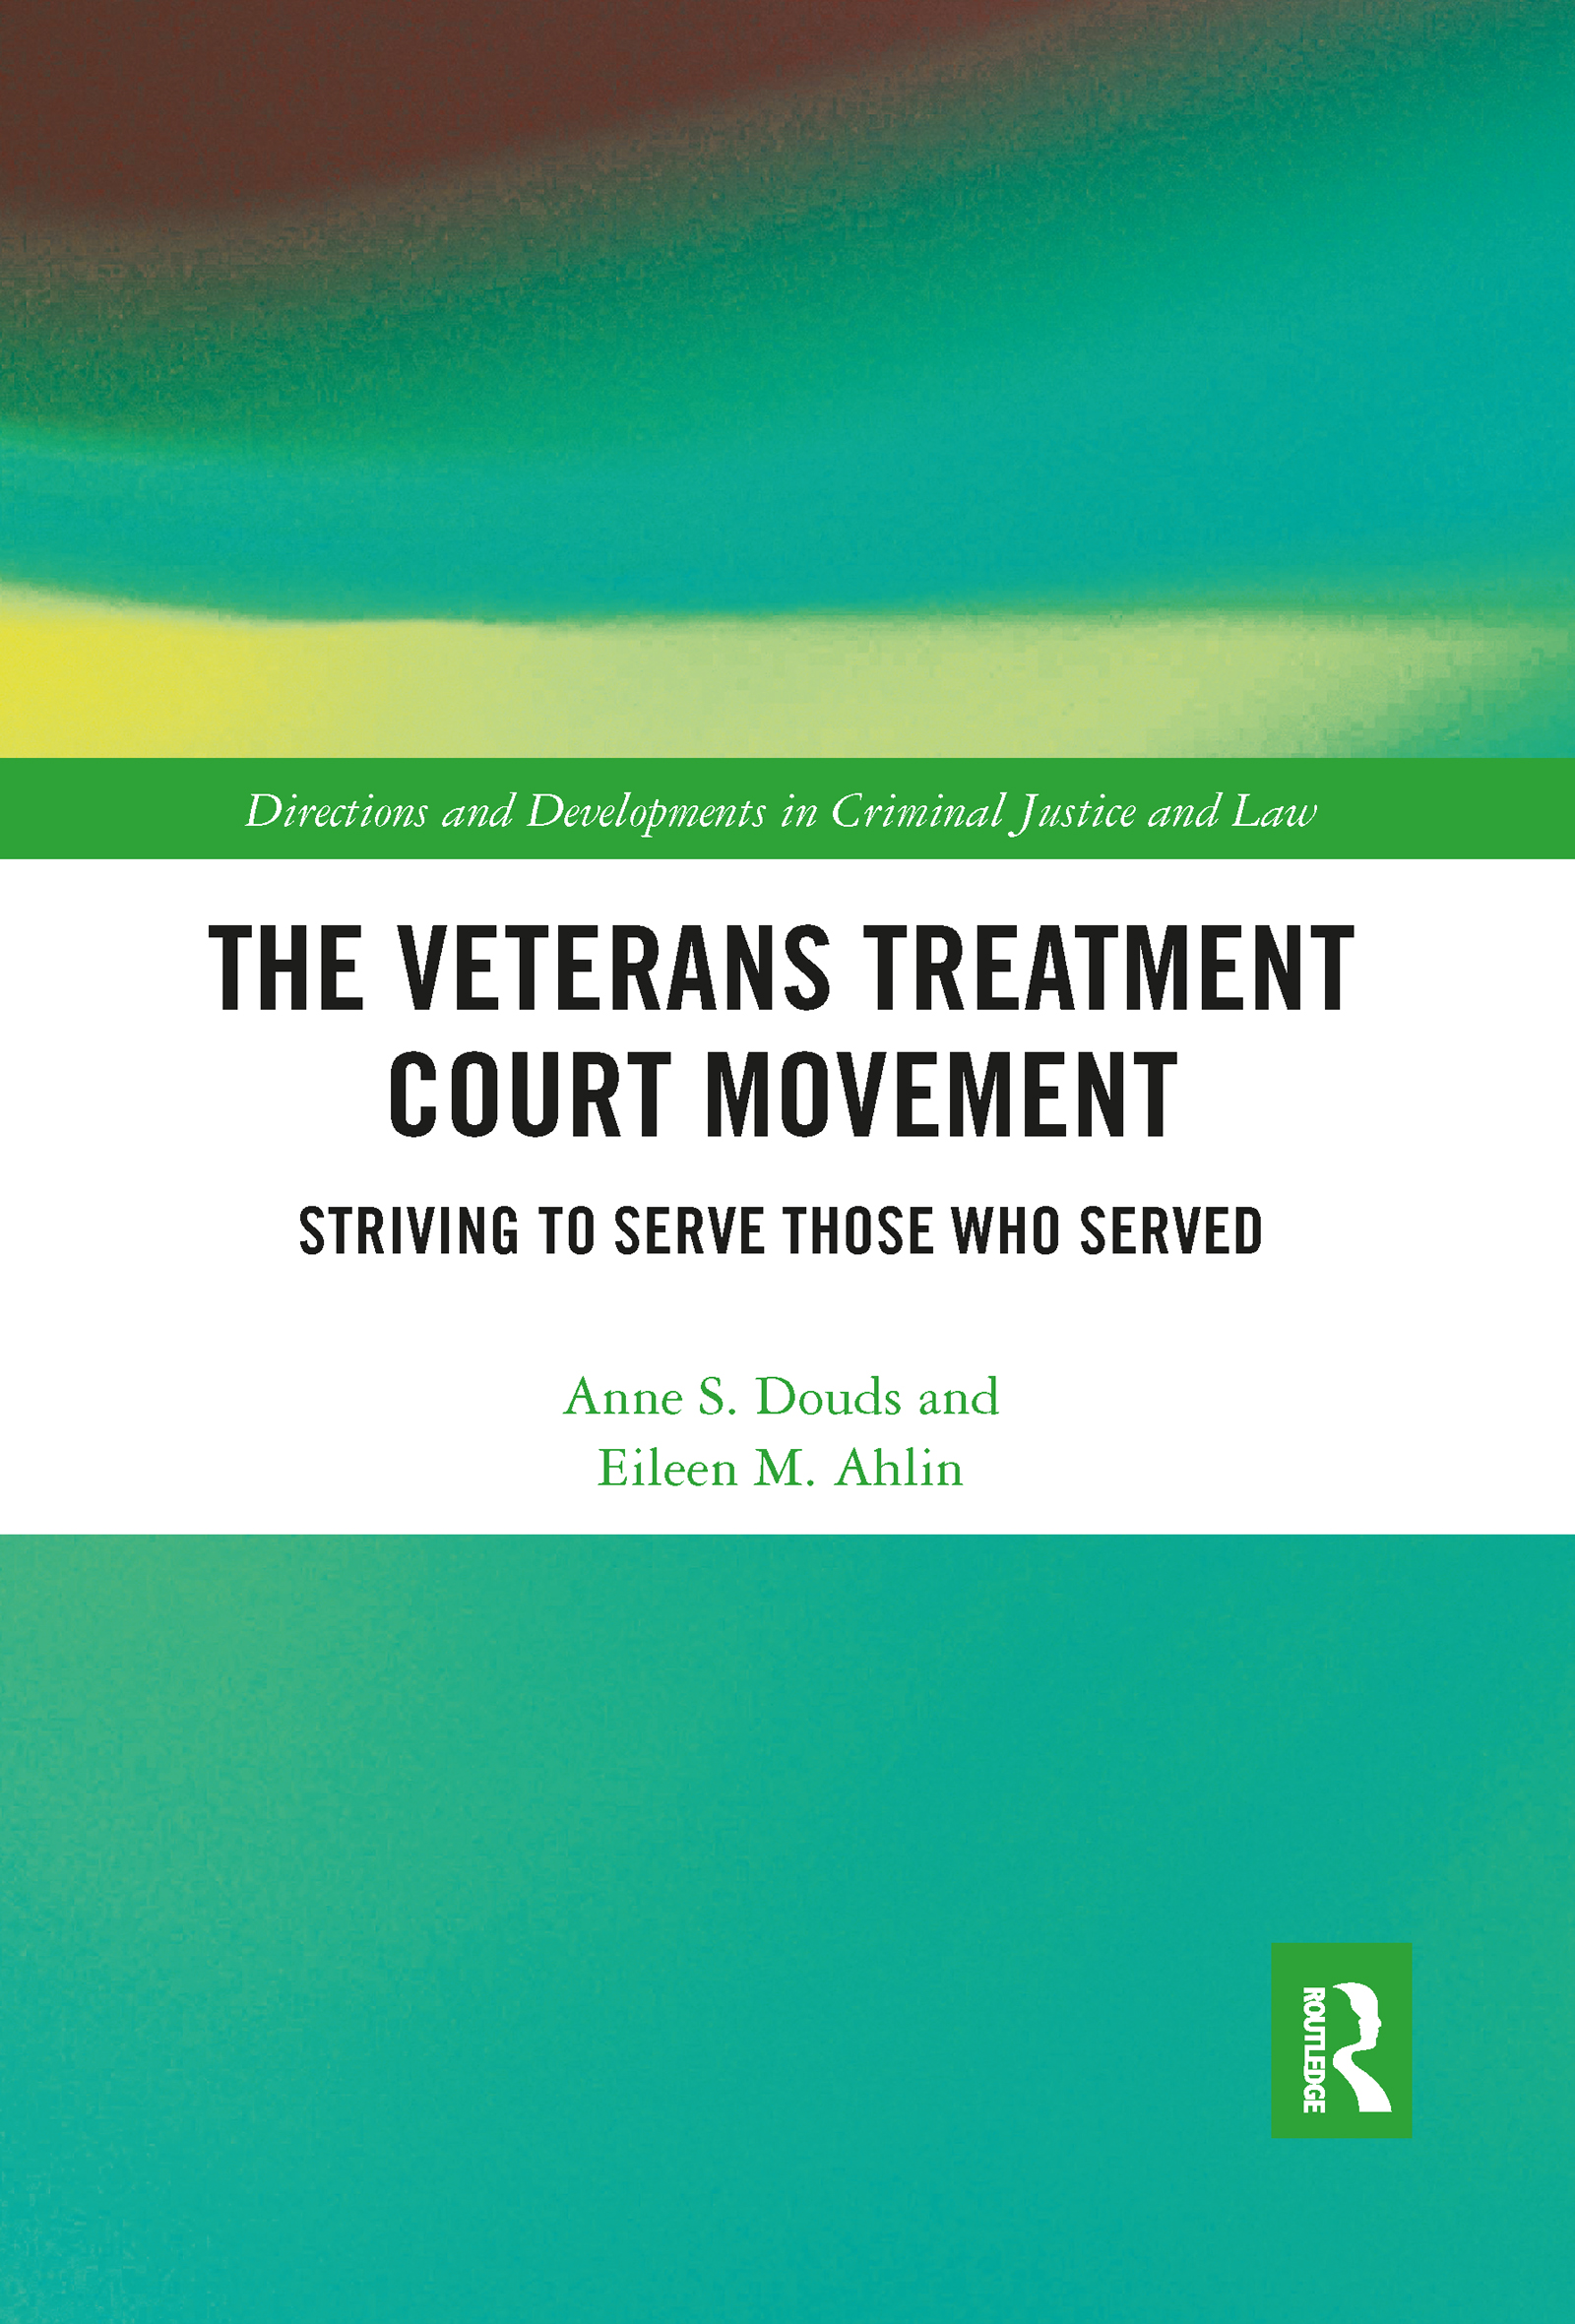 The Veterans Treatment Court Movement